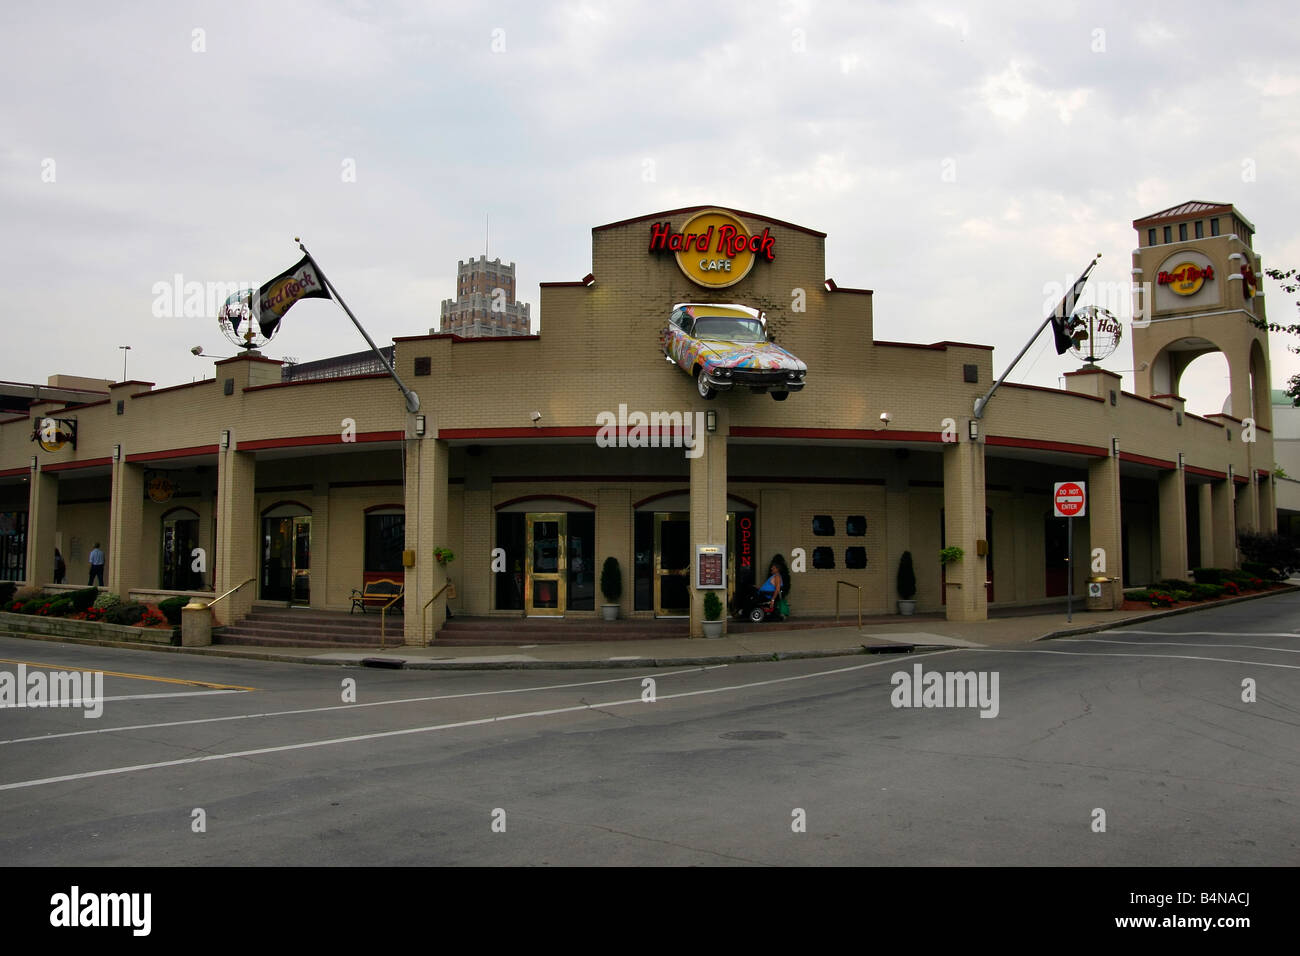 Hard Rock Cafe In Niagara Falls Ny In Usa Stock Photo